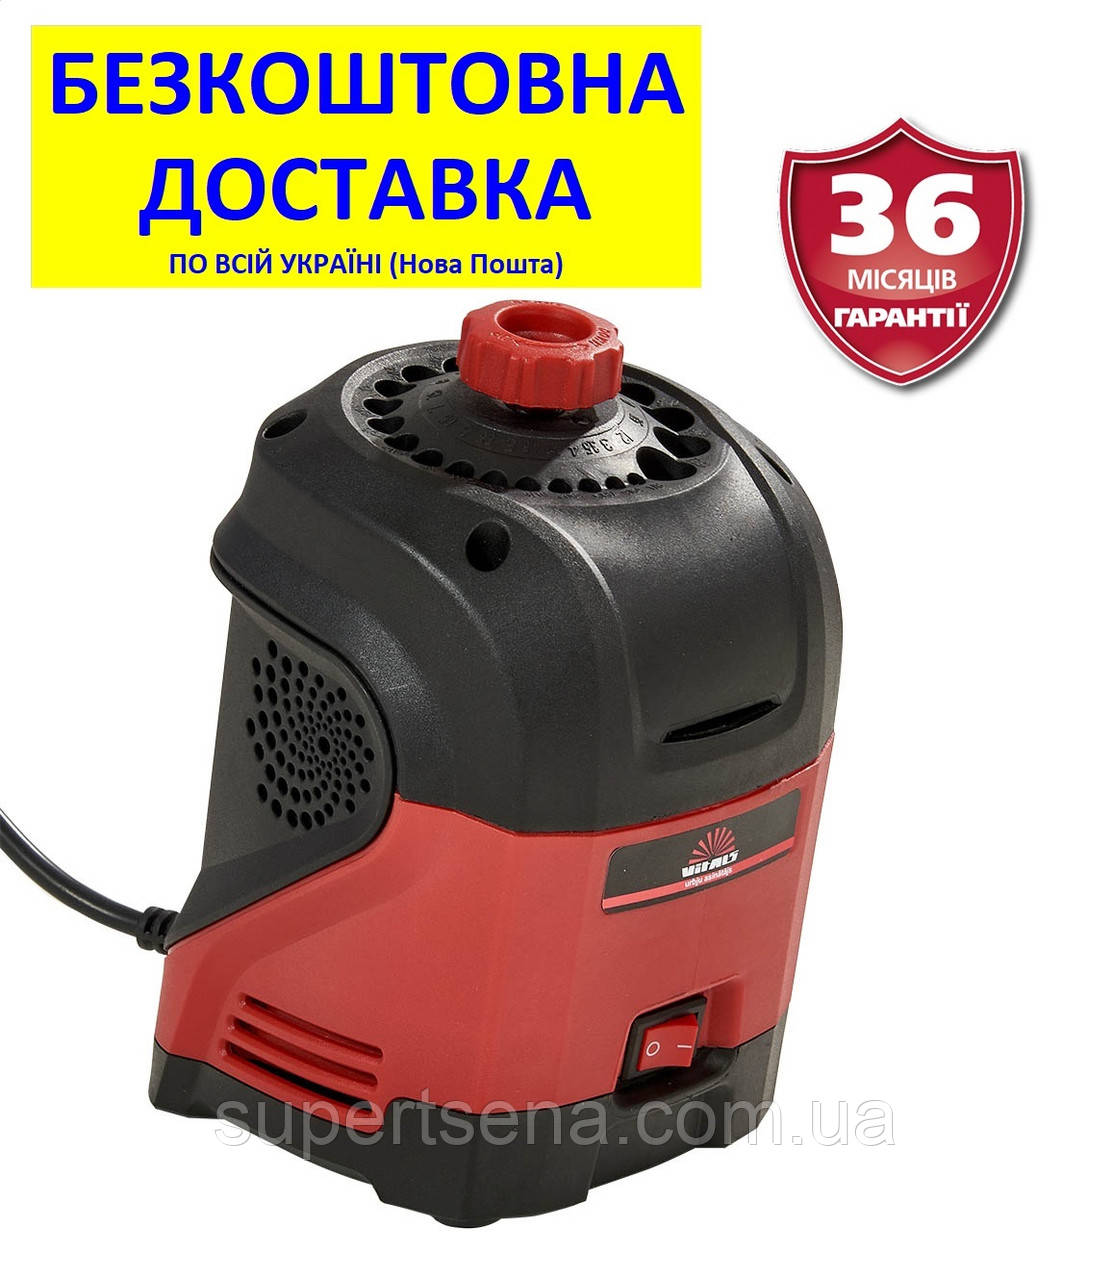 Верстат для заточування свердел Ua 9516JH +БЕЗКОШТОВНА ДОСТАВКА! (95 Вт; 3-12 мм) VITALS, Латвія